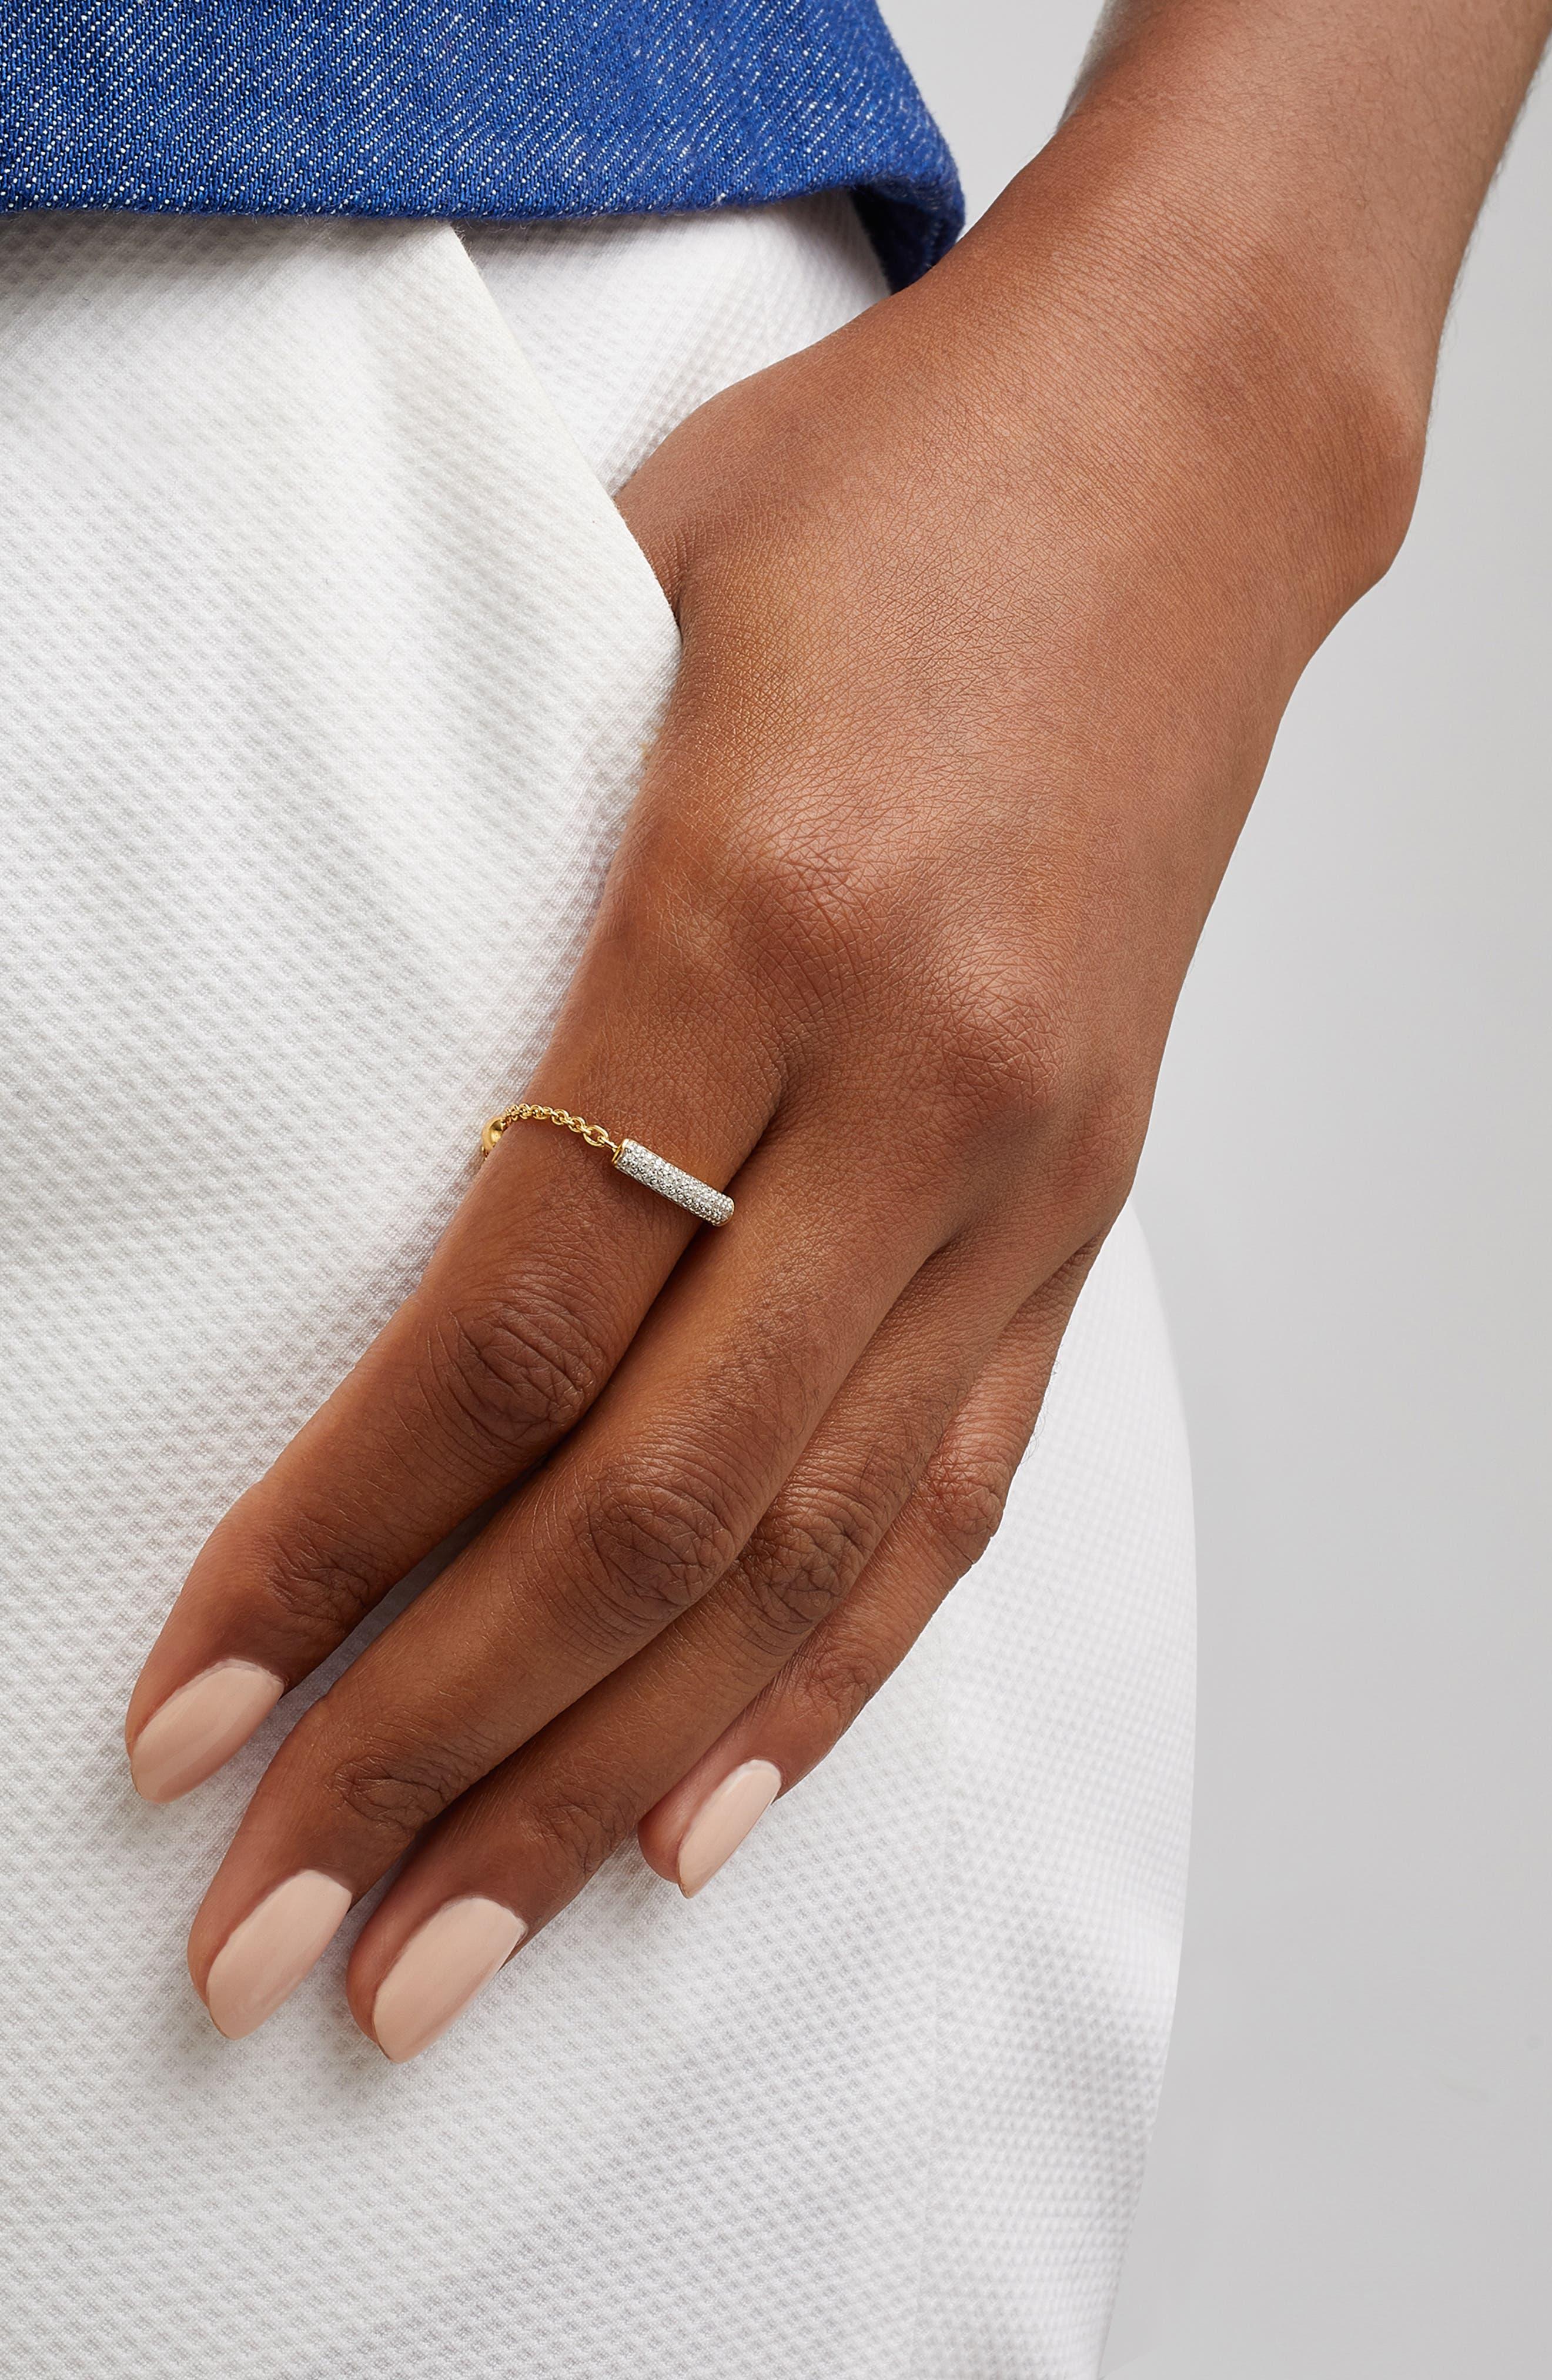 Fiji Bar Friendship Diamond Chain Ring,                             Alternate thumbnail 2, color,                             METALLIC GOLD/ DIAMOND